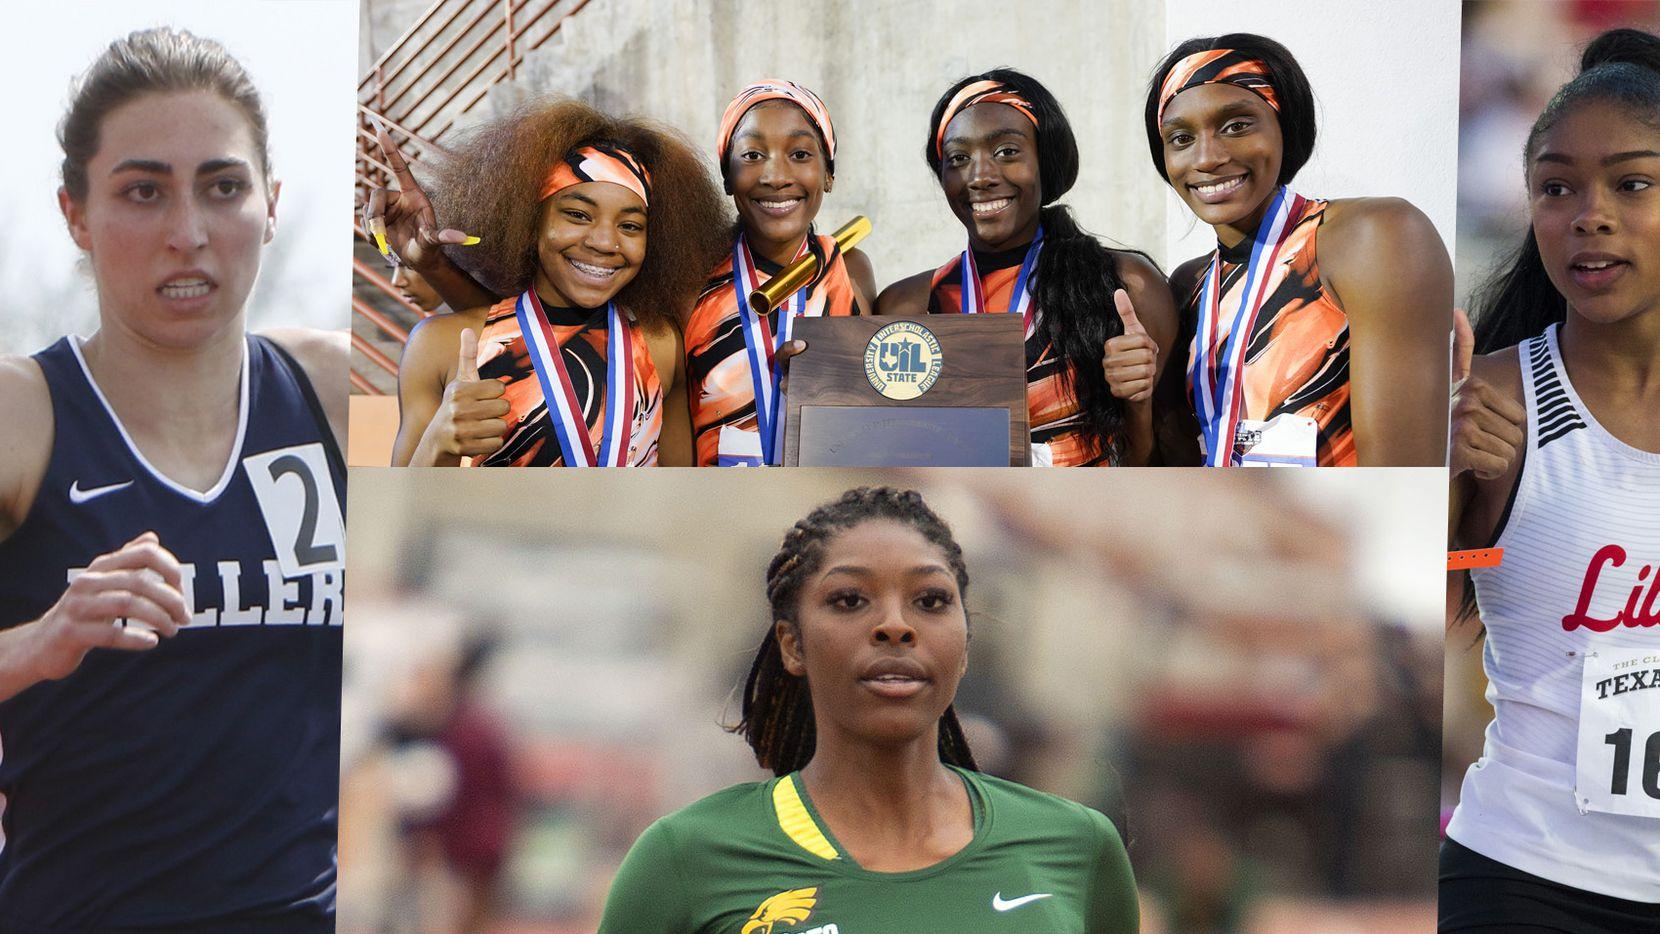 Far left: Keller's Isabel Van Camp. Top middle: Lancaster's 4x200 relay team -- Aysia Ward, Trelondra Strong, Cornesia Calhoun and Kiara Smith.Bottom middle: DeSoto's Rosaline Effiong.Far right: Frisco LIberty's Nissi Kabongo.